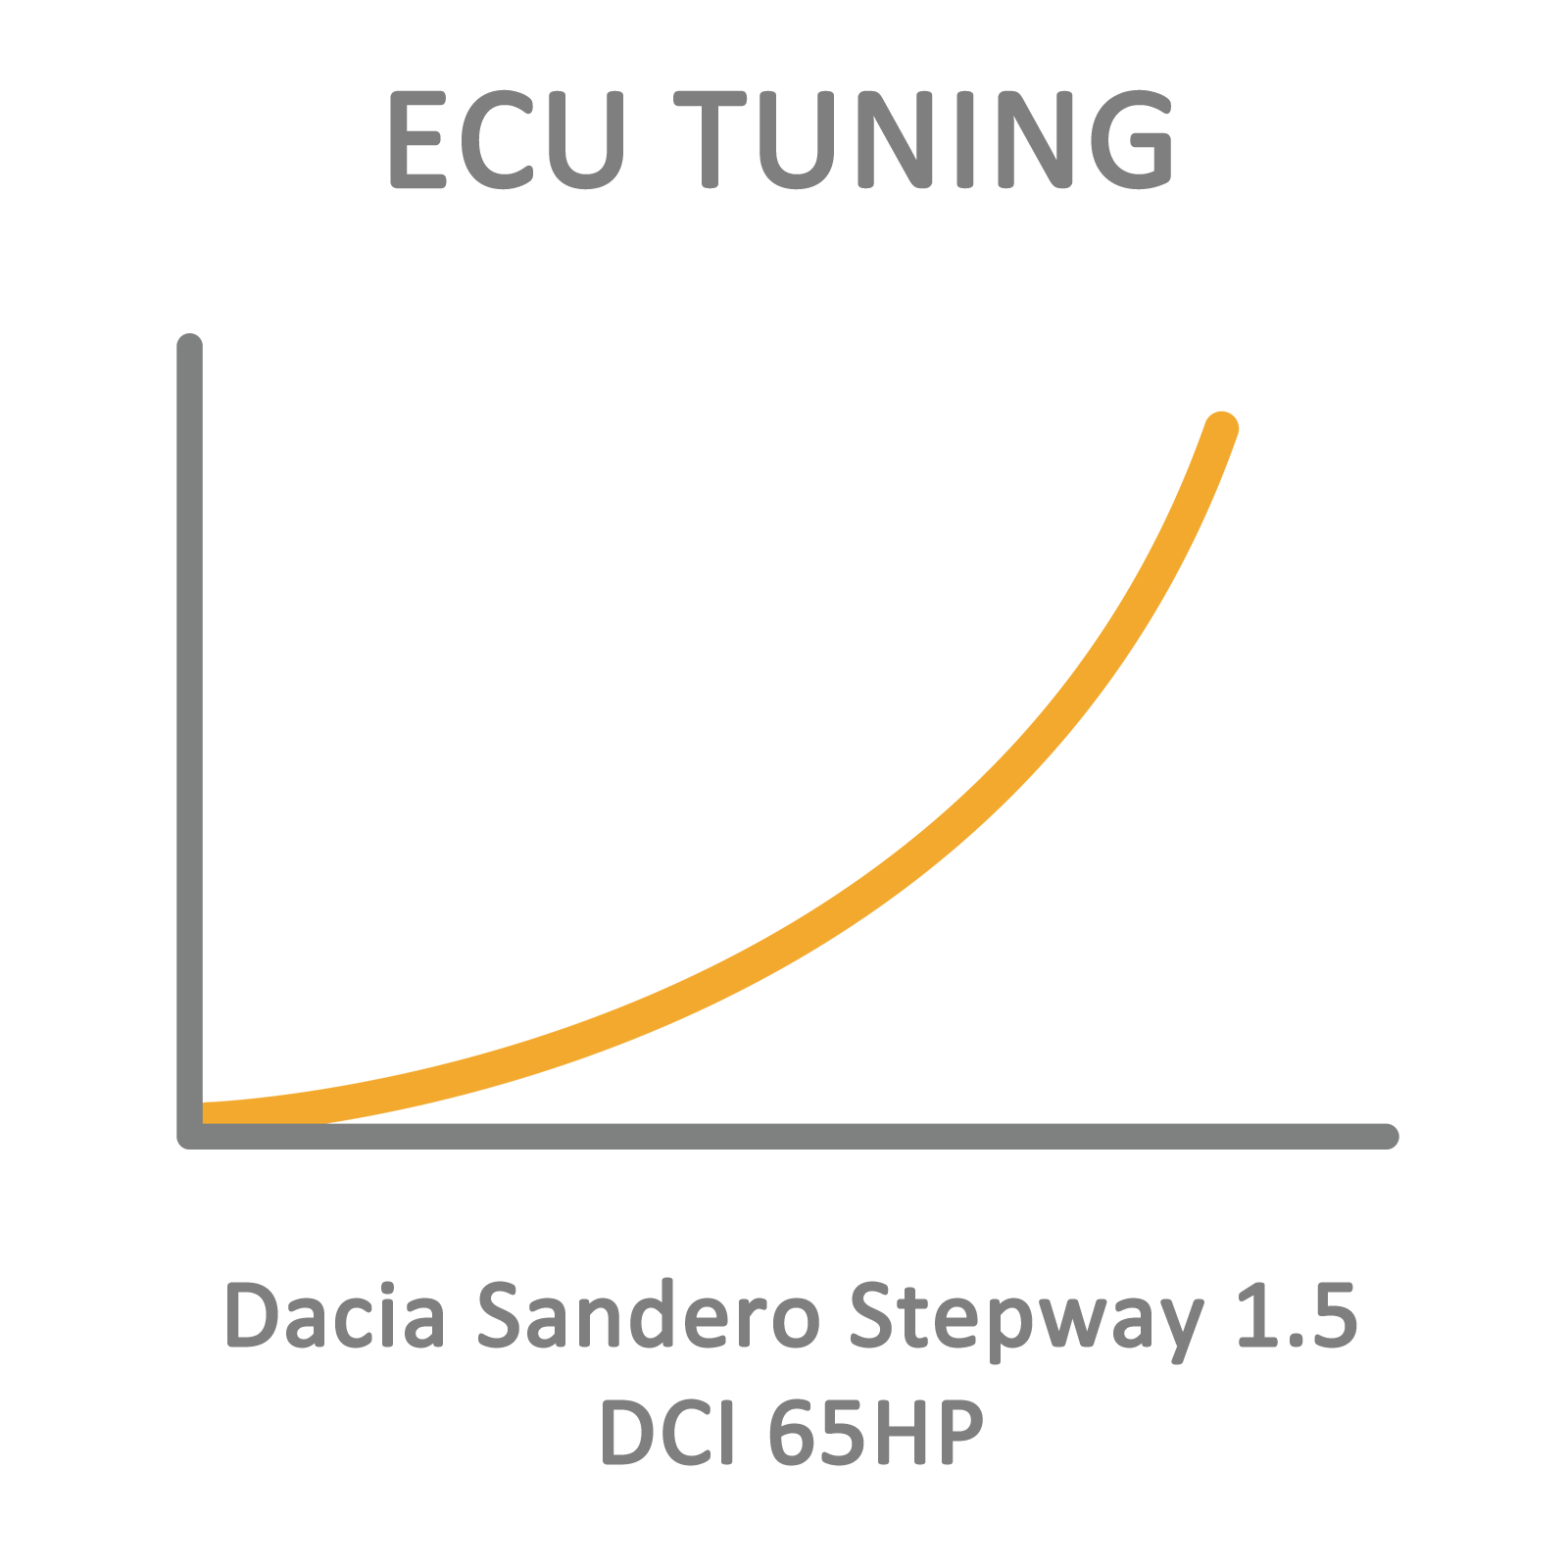 Dacia Sandero Stepway 1.5 DCI 65HP ECU Tuning Remapping